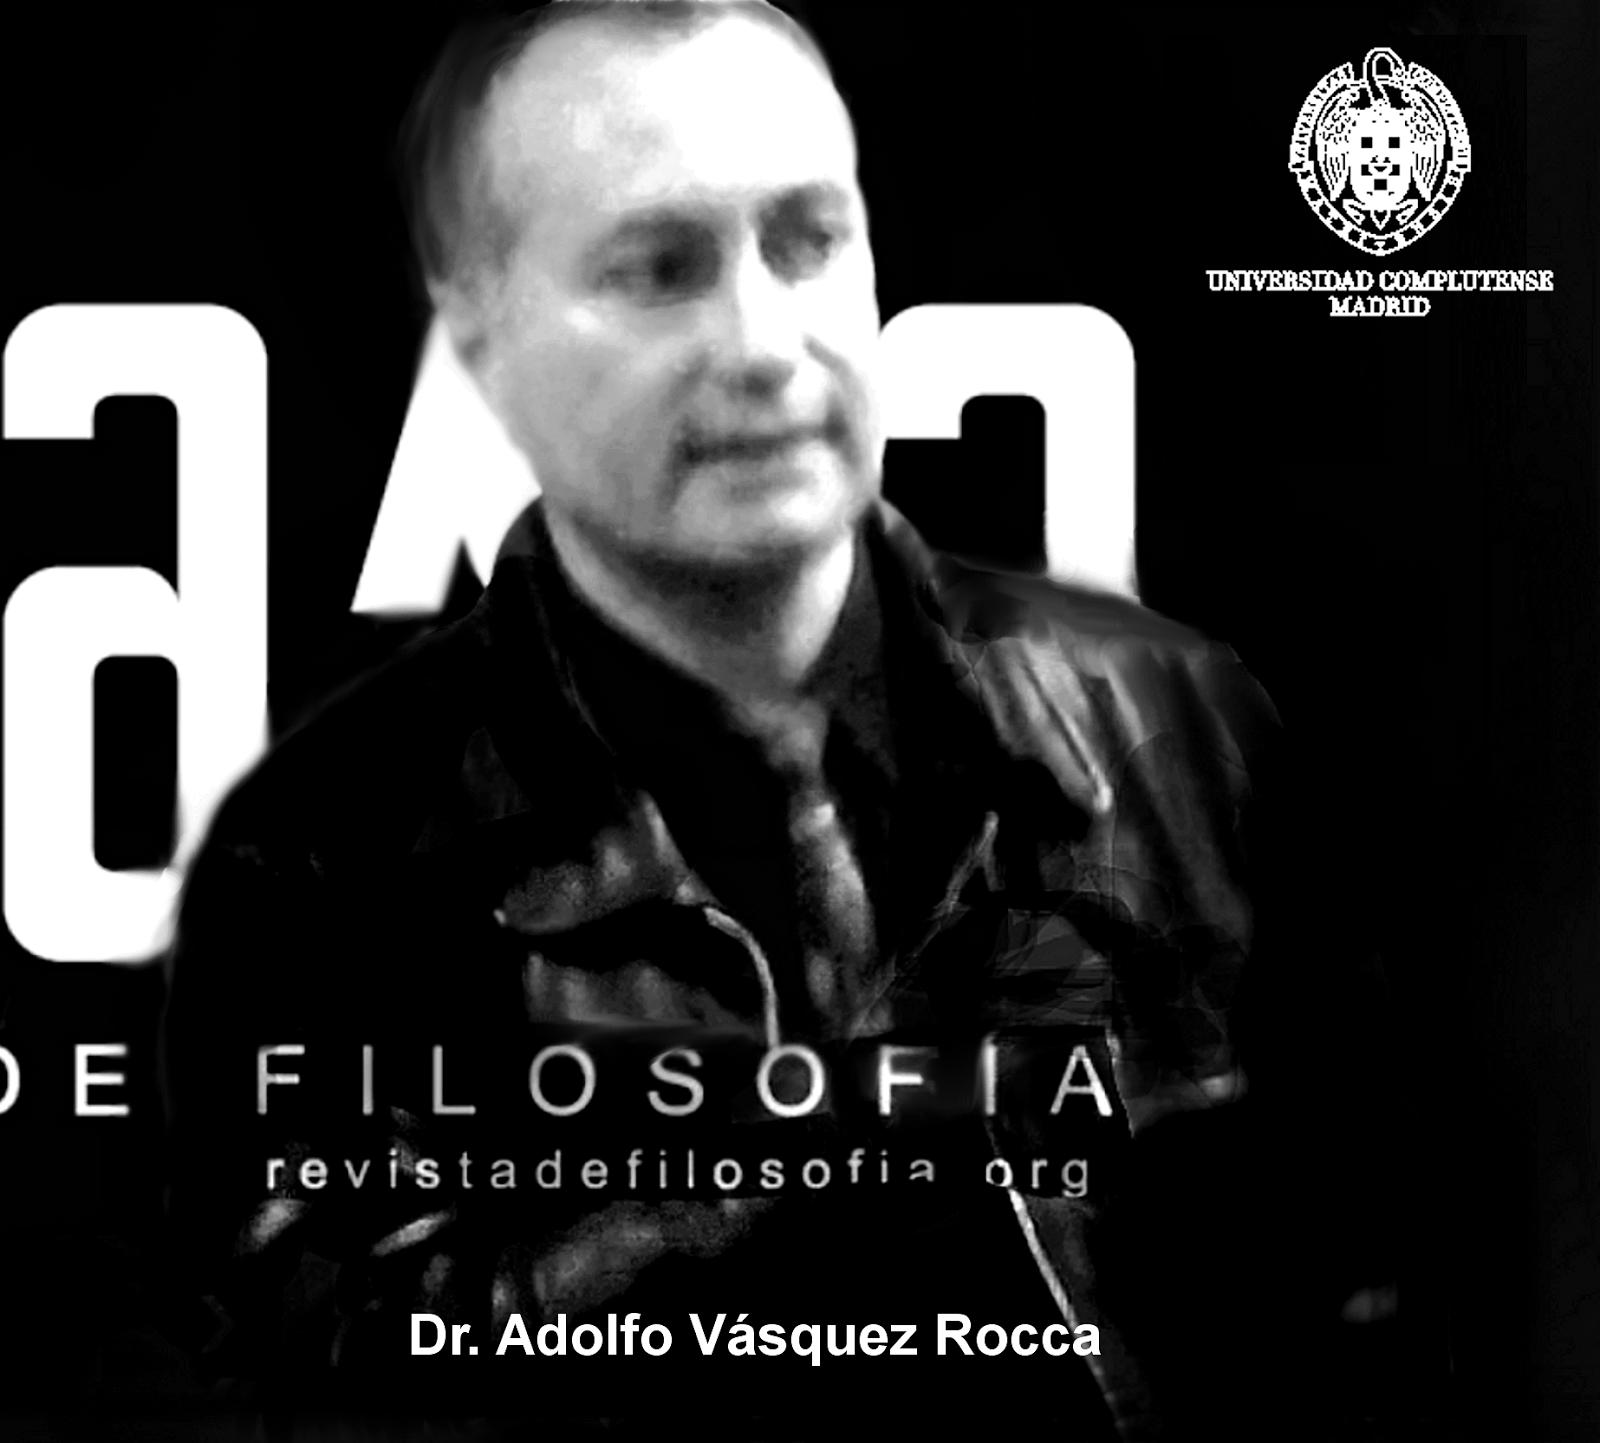 http://1.bp.blogspot.com/-CWdXTNZbs4o/UsZFinud-8I/AAAAAAAAM0M/q9uY8iDsmc4/s1600/Adofo+Vasquez+Rocca++PHD.+2.0+bn+_+Revista+Eikasia+_+Sociedad+Asturiana+de+Filosof%C3%ADa+7000+BN+individual.png